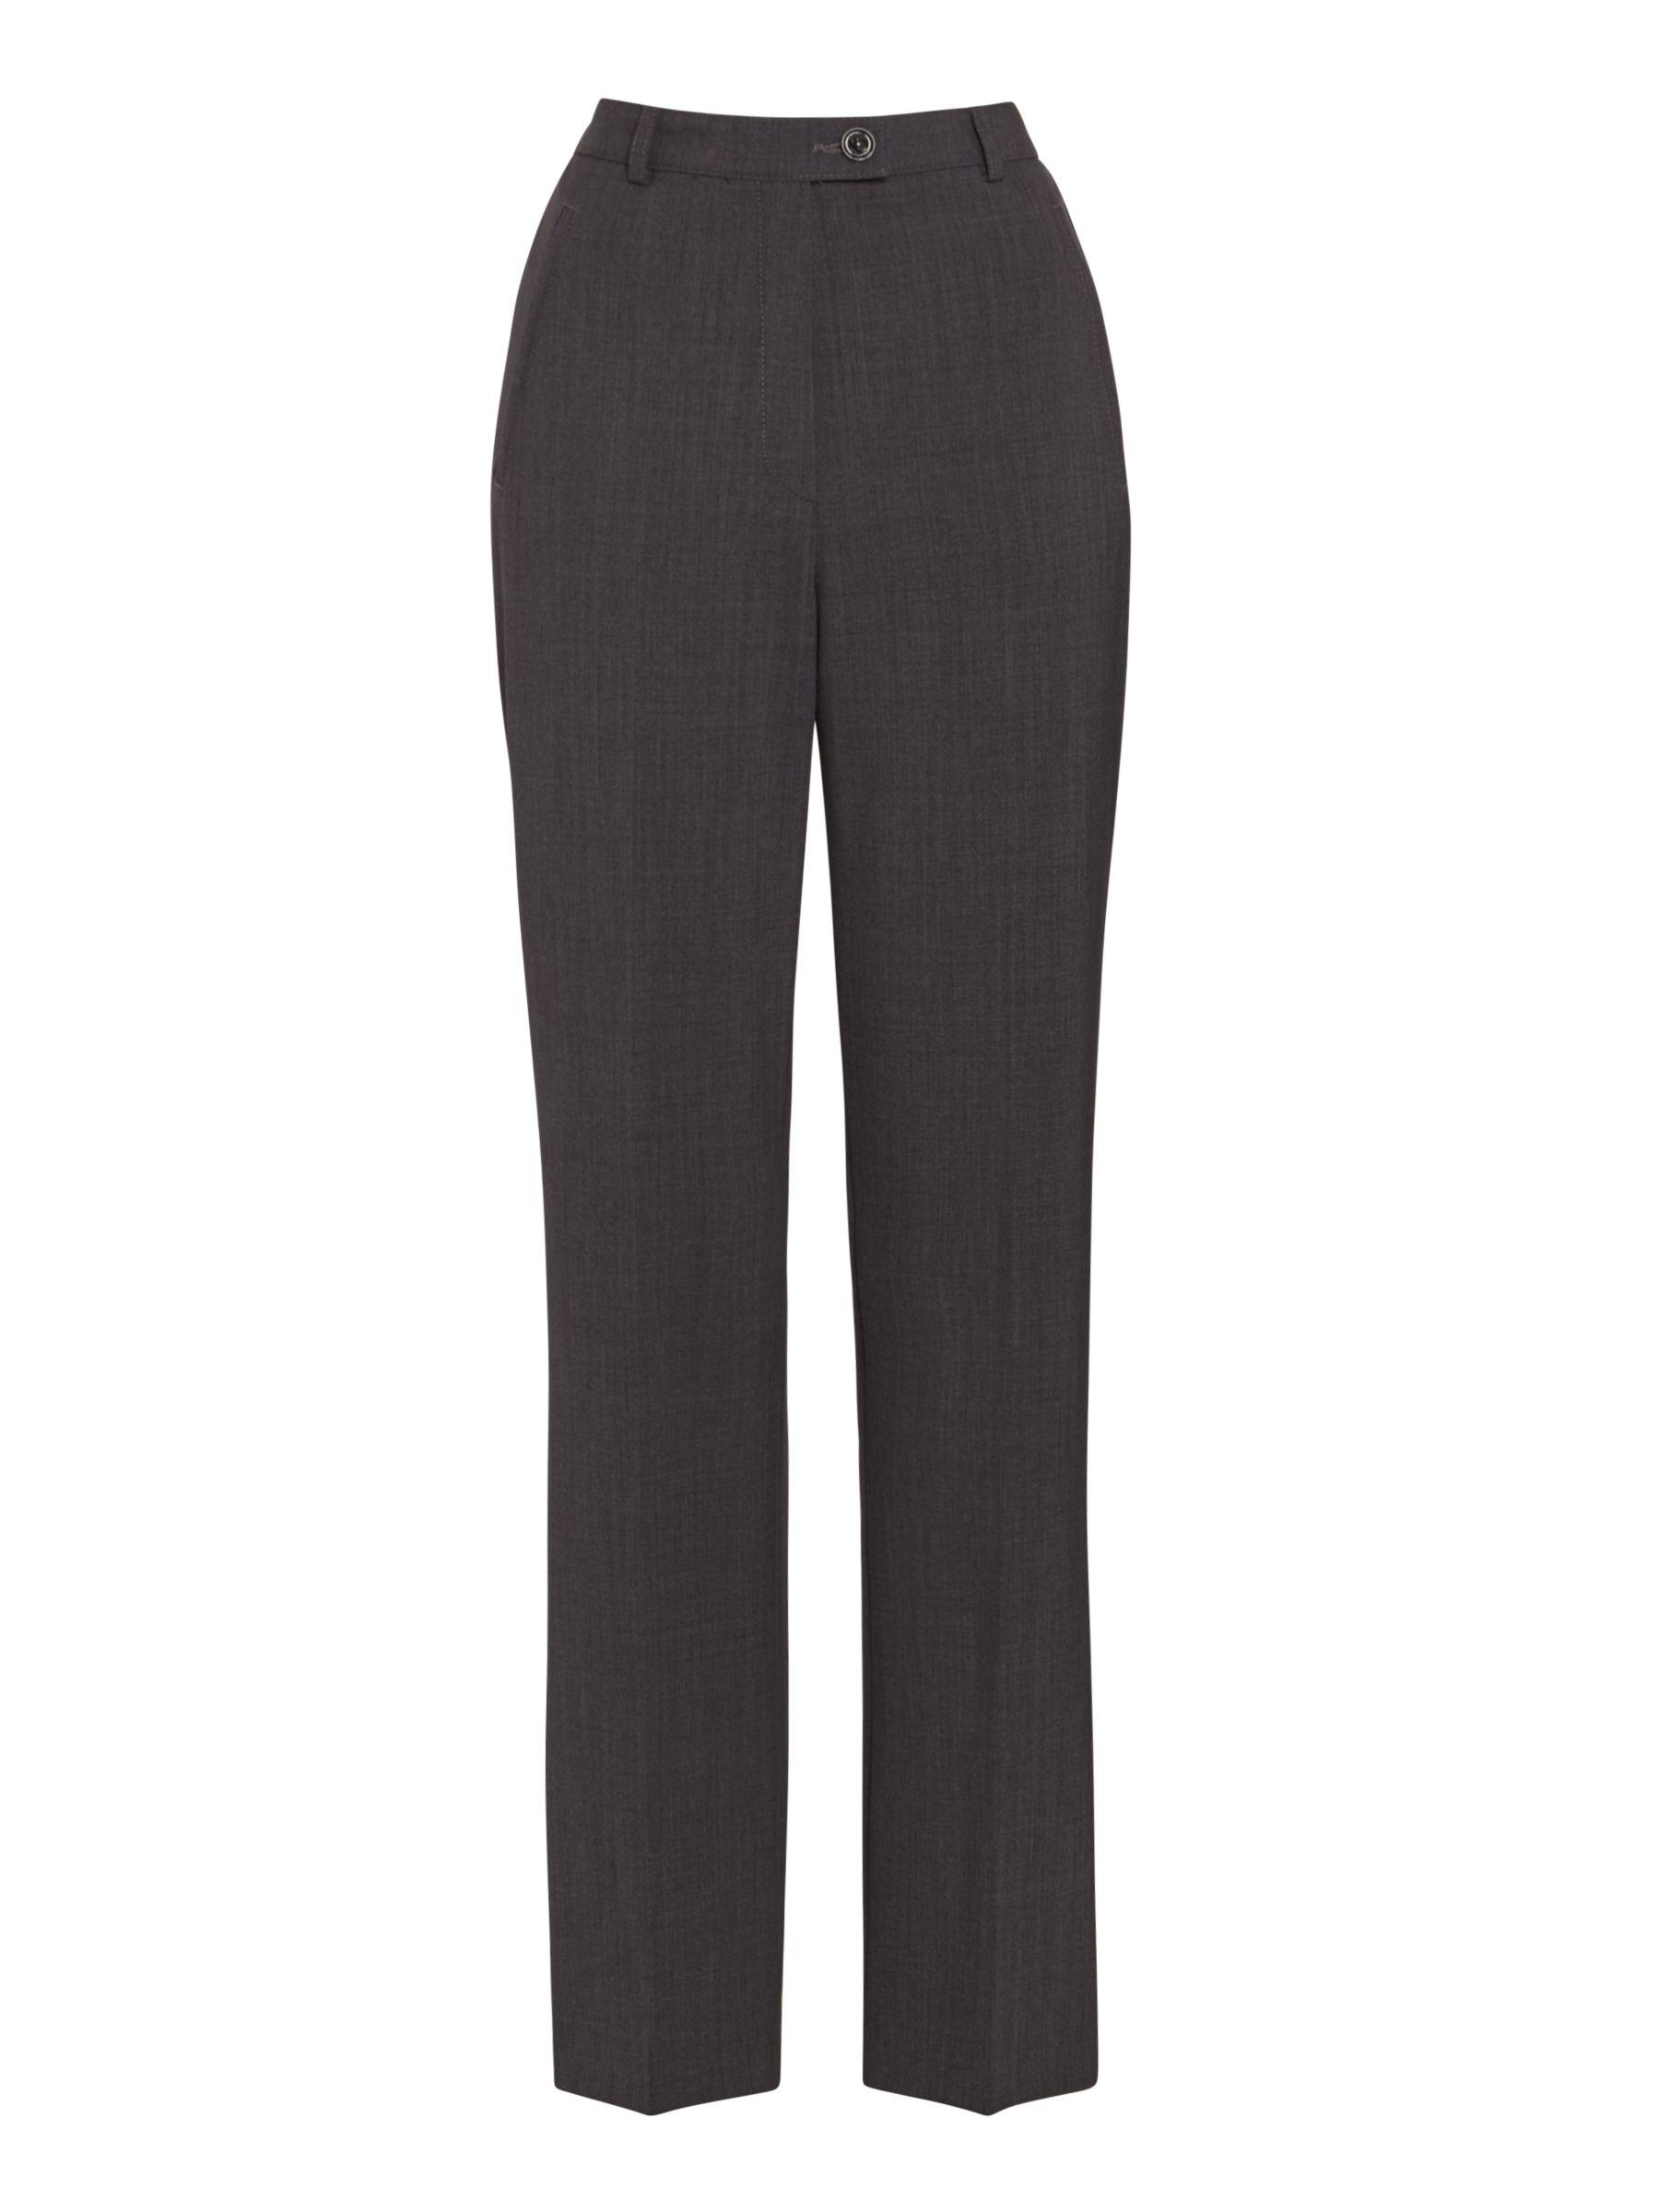 Gardeur Gardeur City Straight Leg High Rise Trousers, Grey